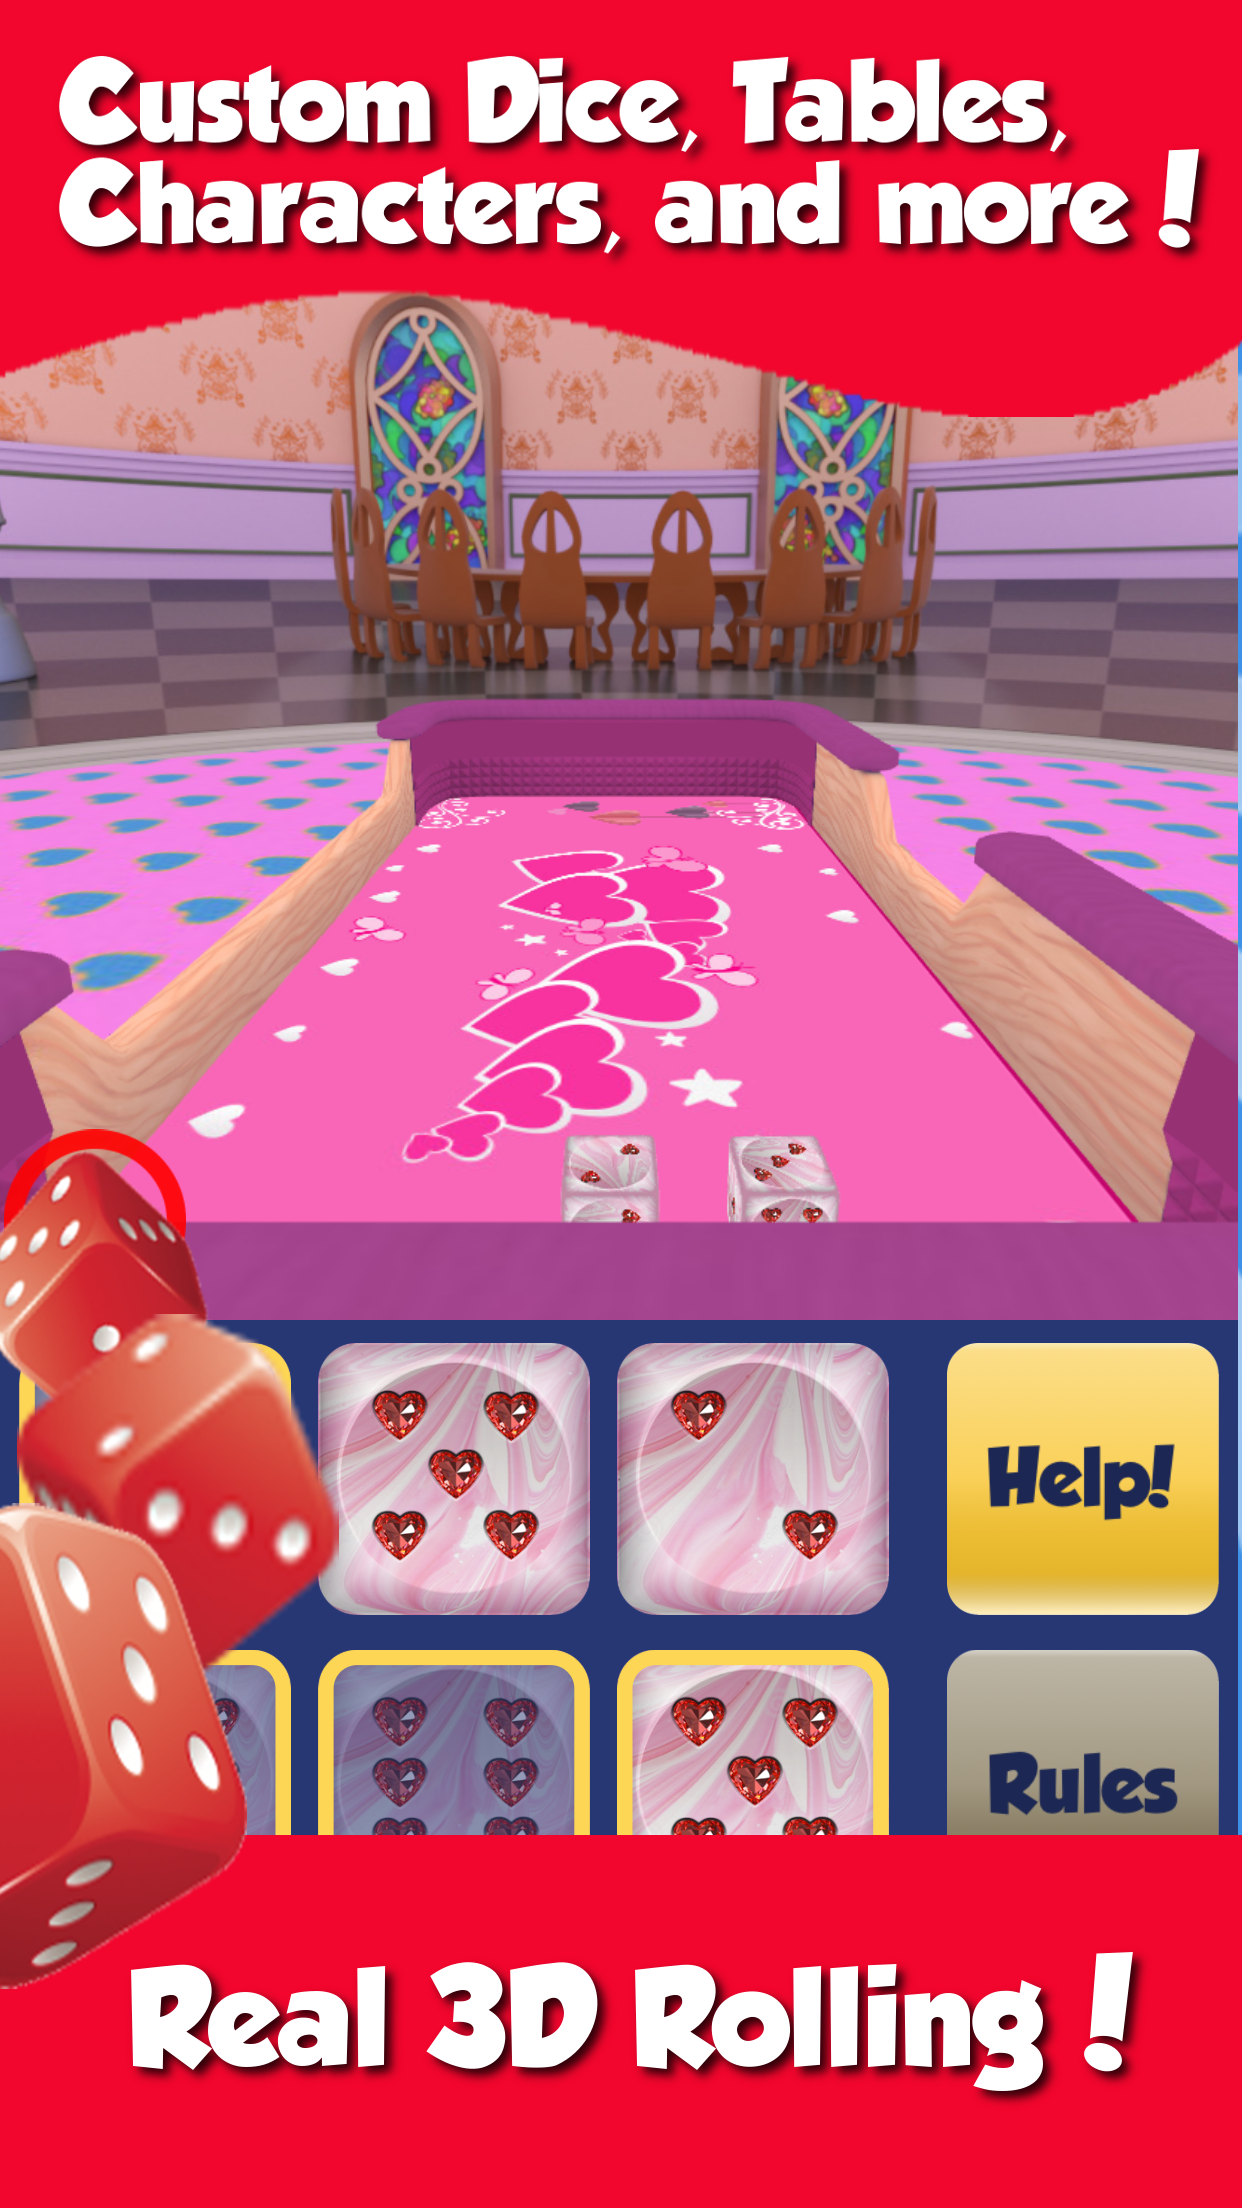 Dice World - 6 Dice Games Screenshot